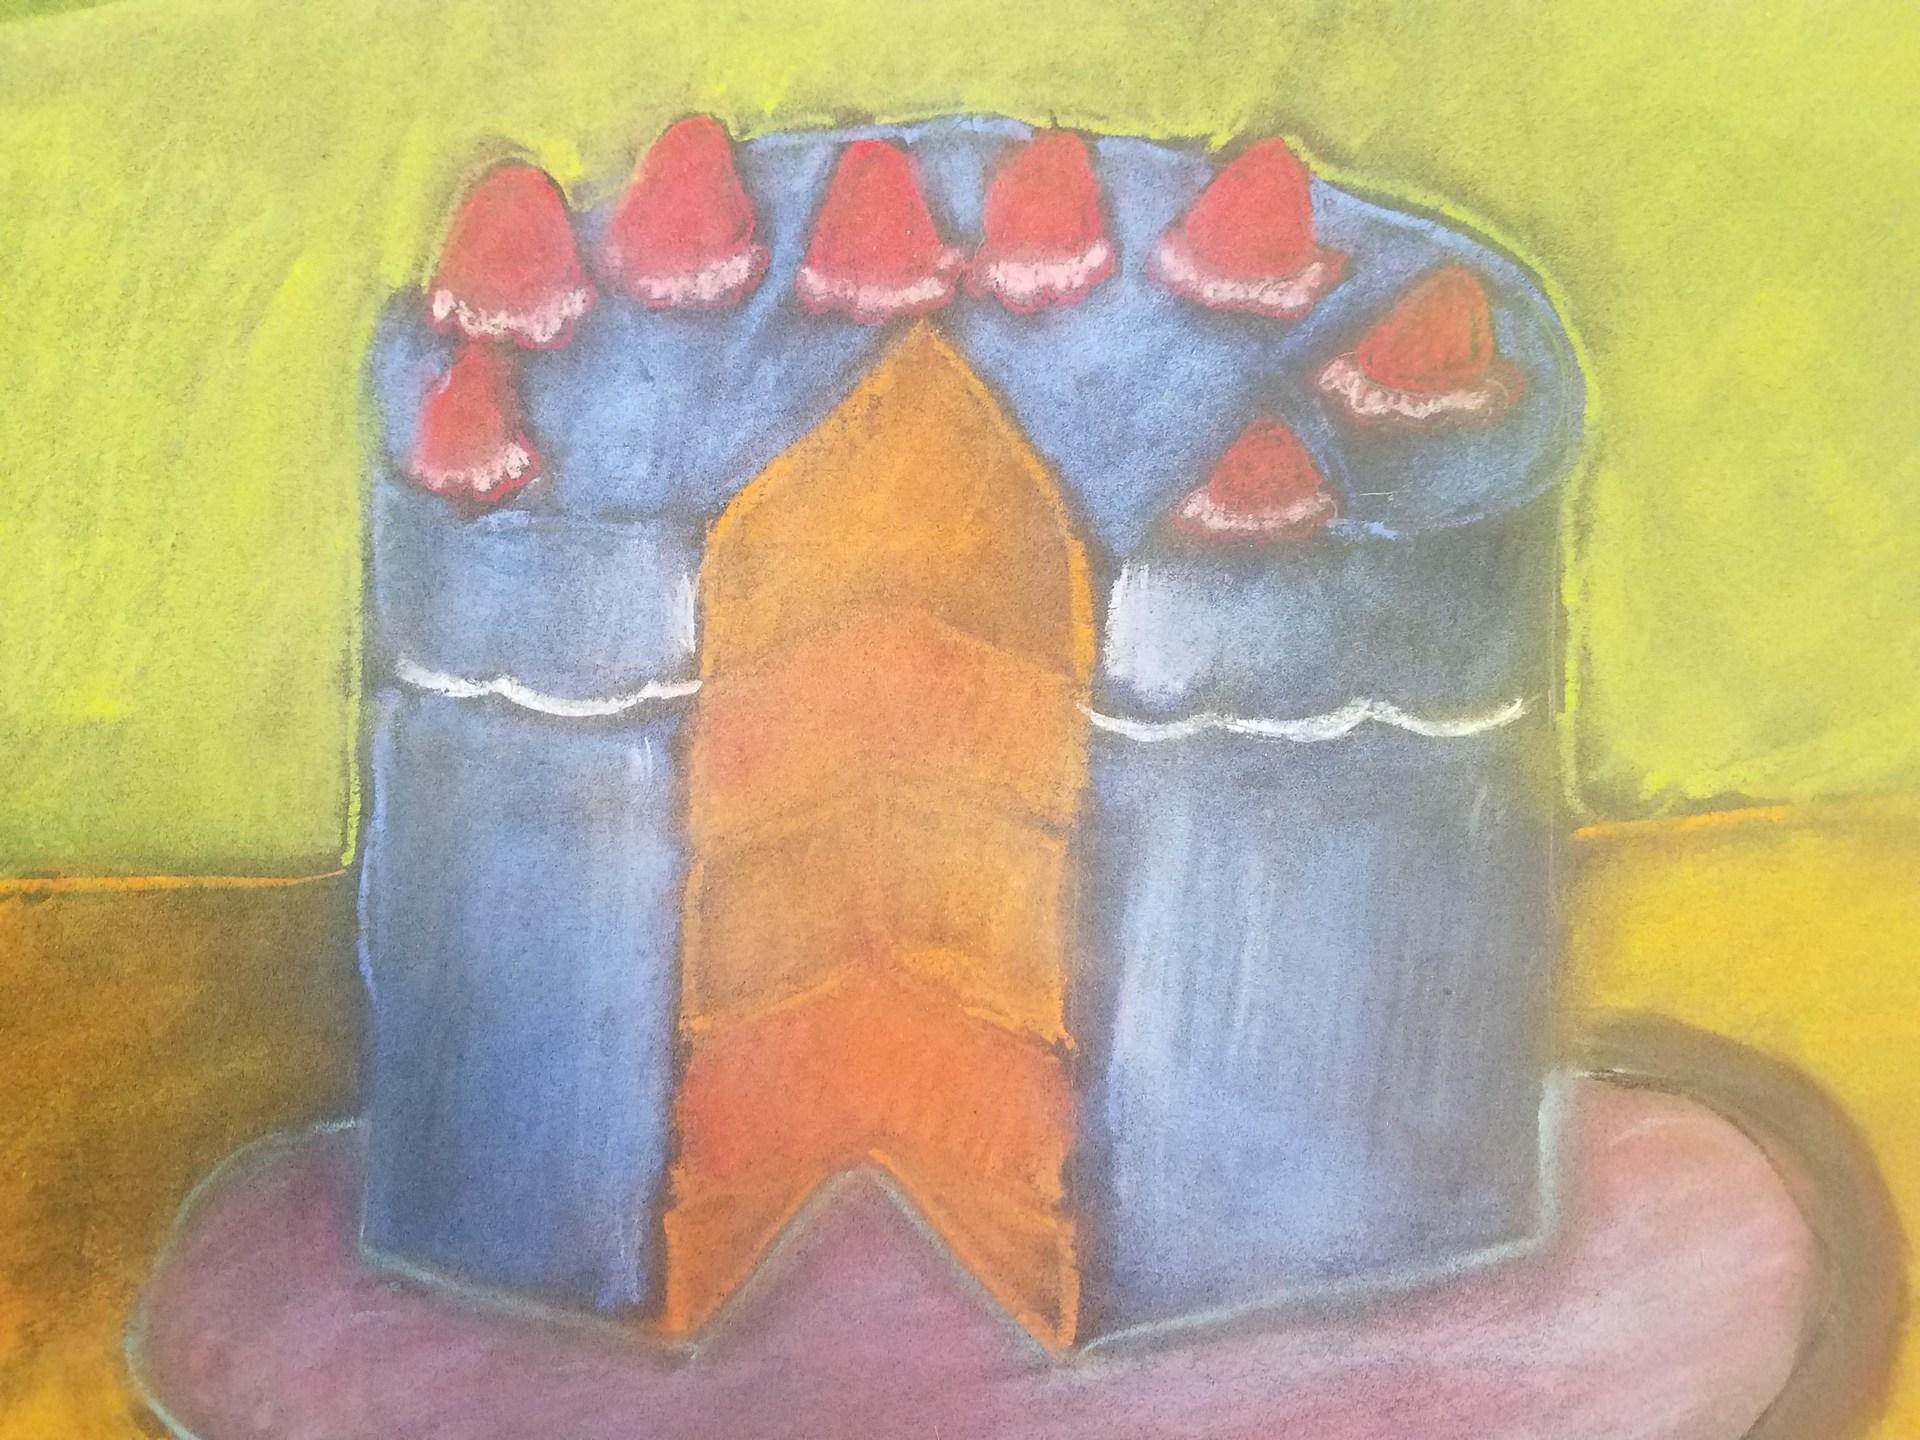 Wayne Thiebaud inspired pastel drawing by Abigail Bretz.